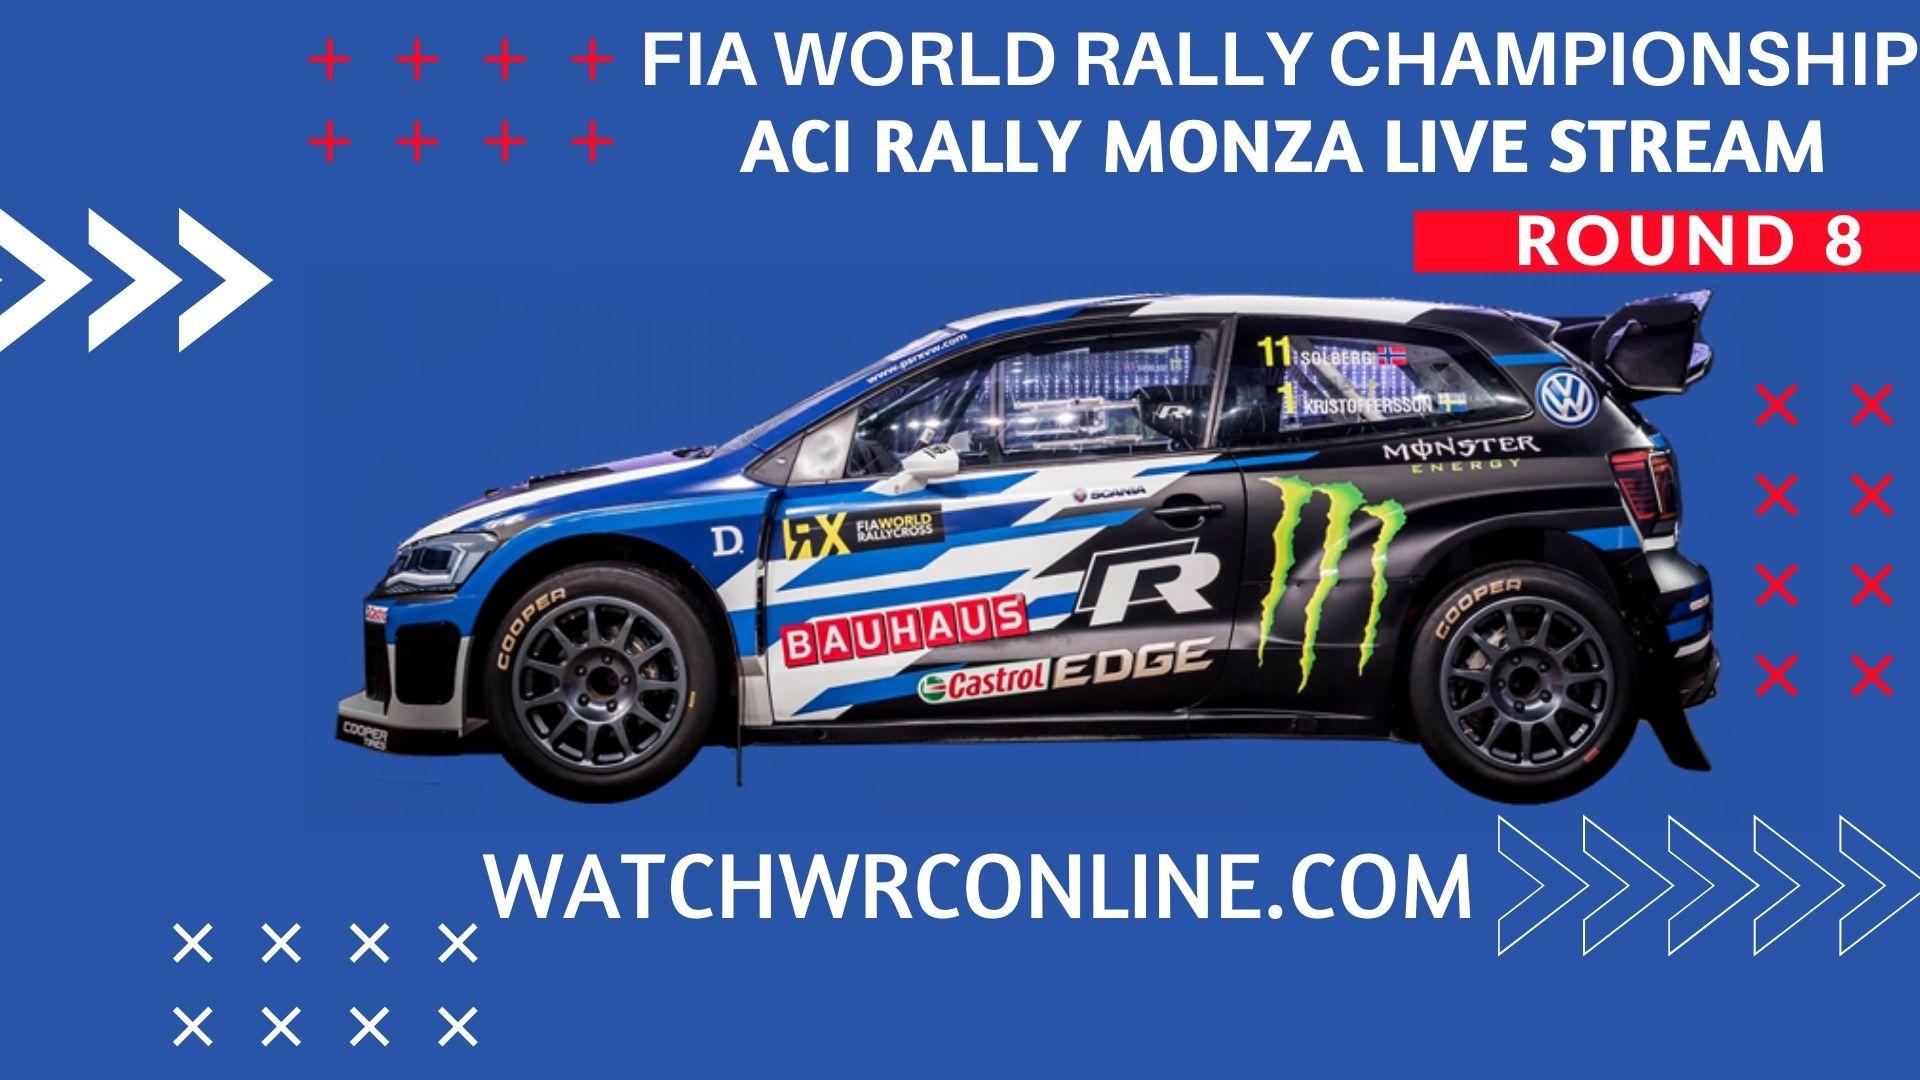 aci-rally-monza-live-stream